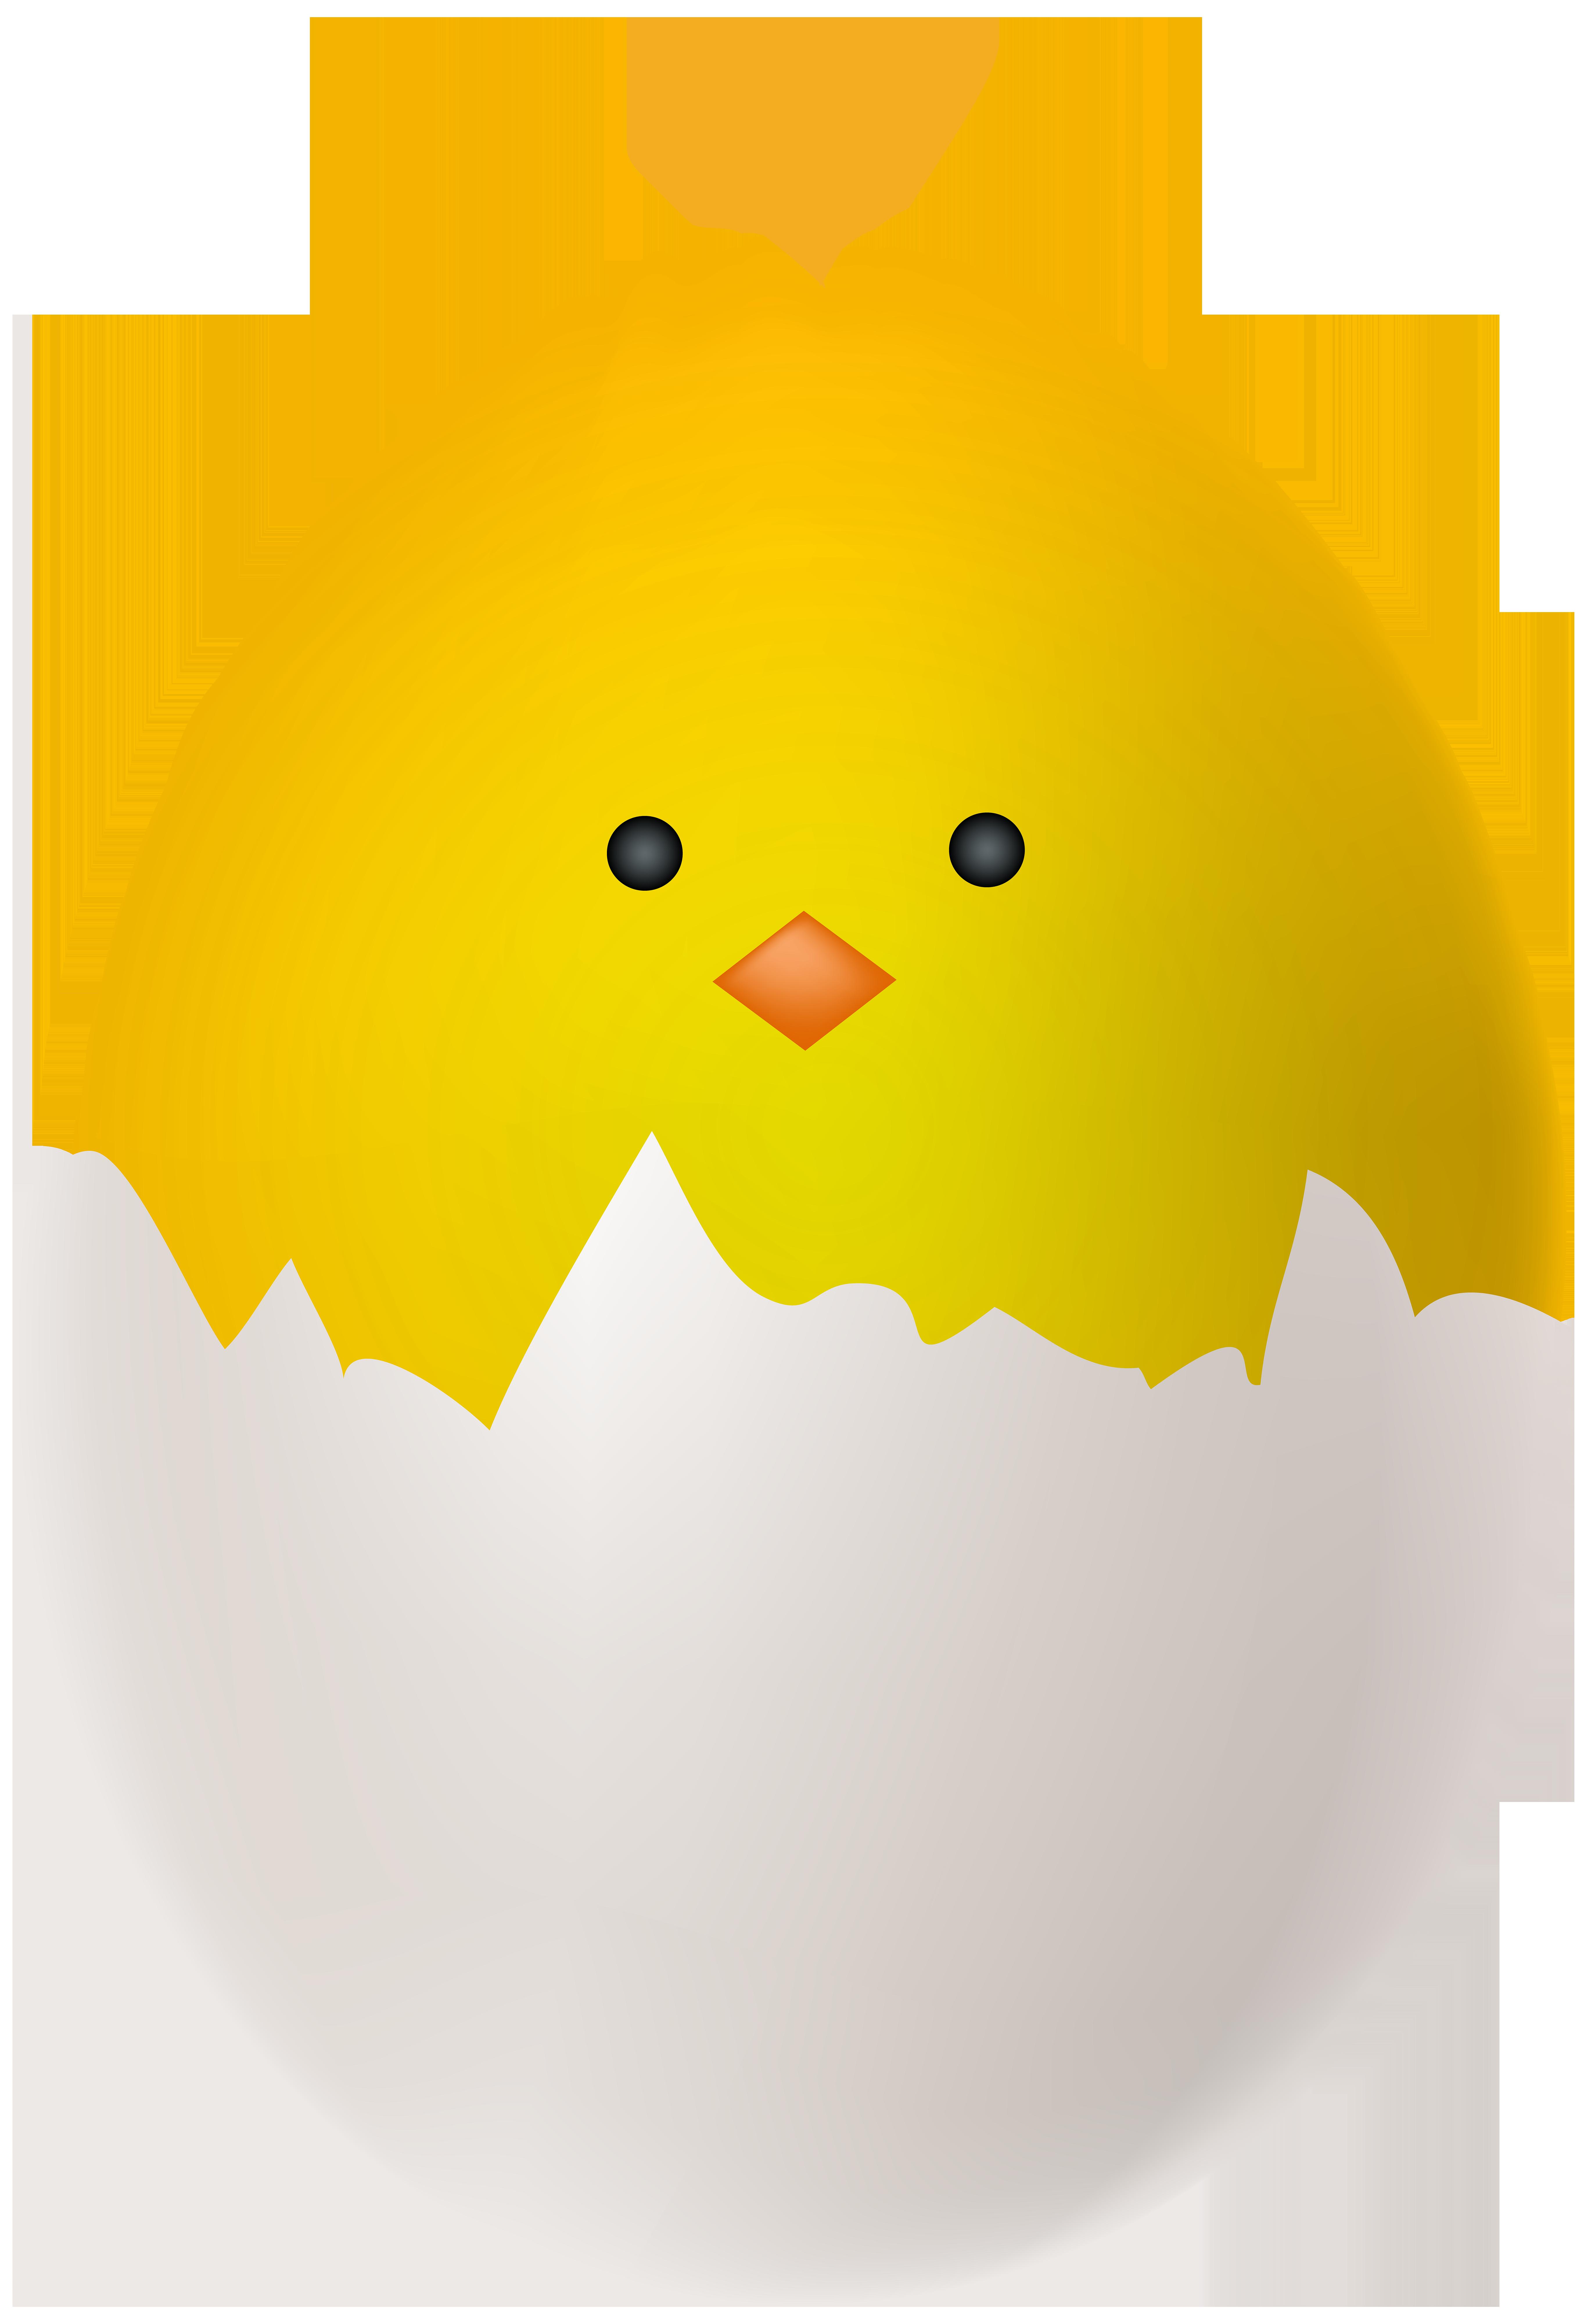 Easter Chicken Egg Transparent Clip Art.